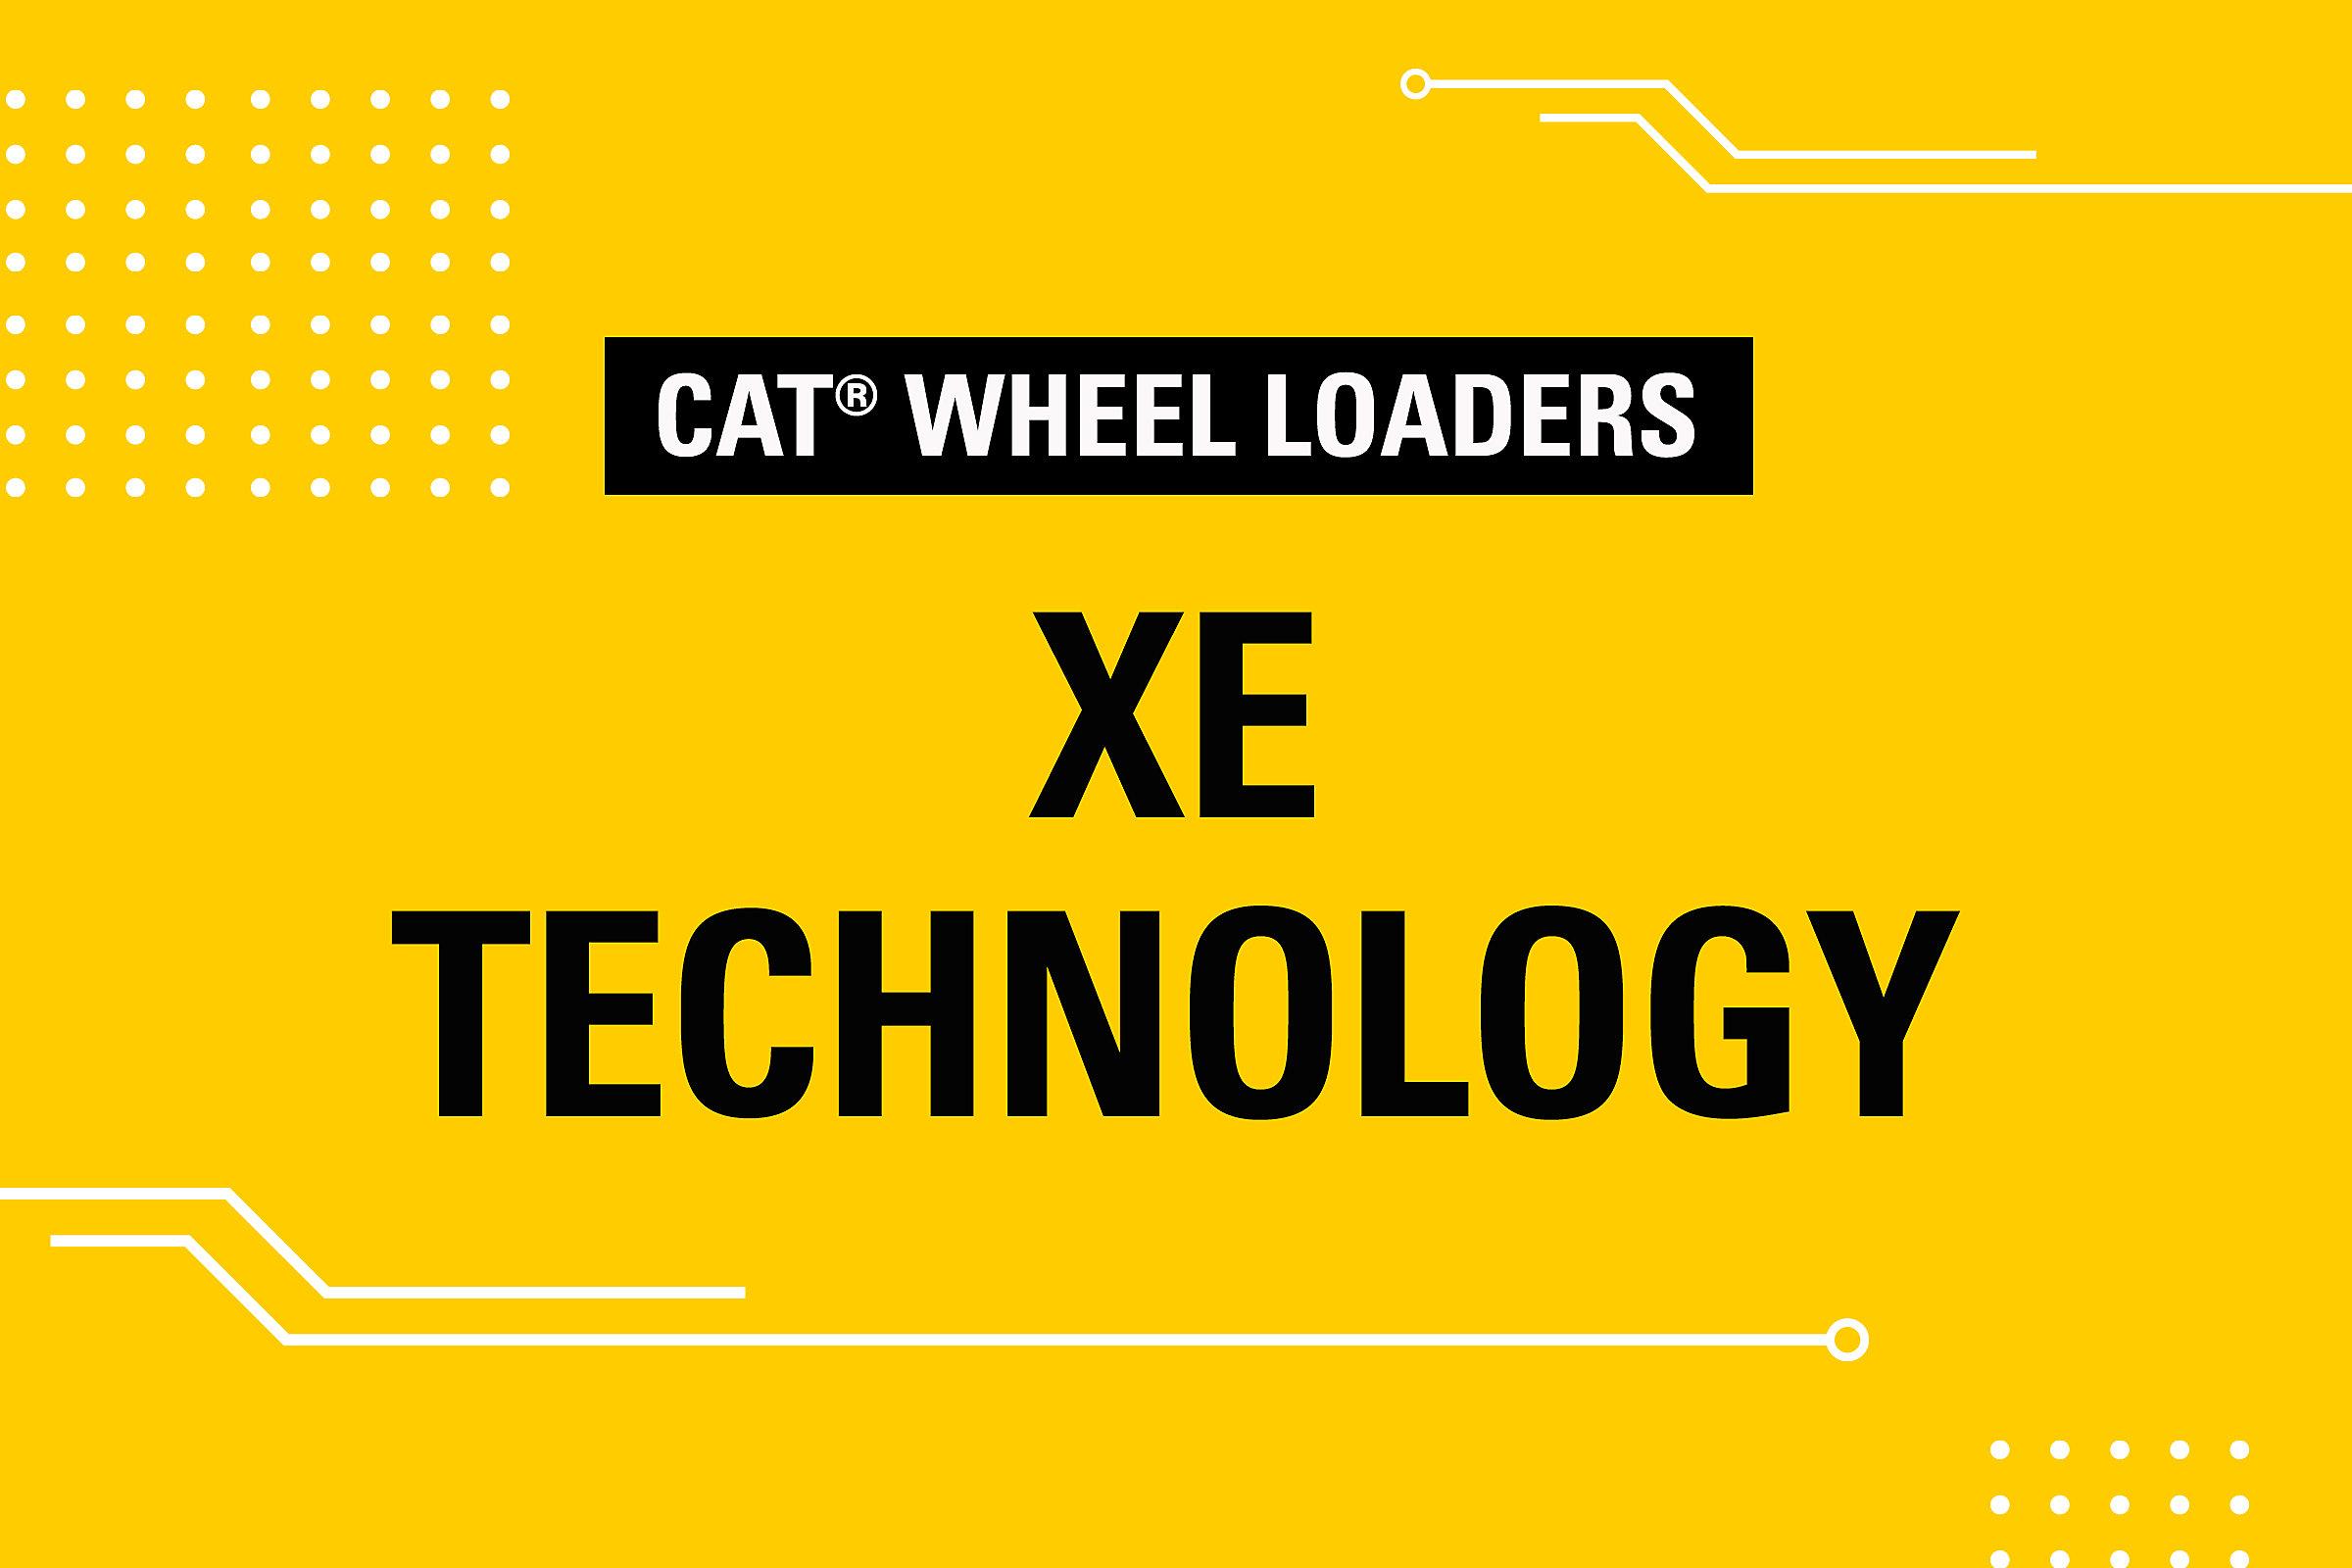 Wheel Loaders XE Technology